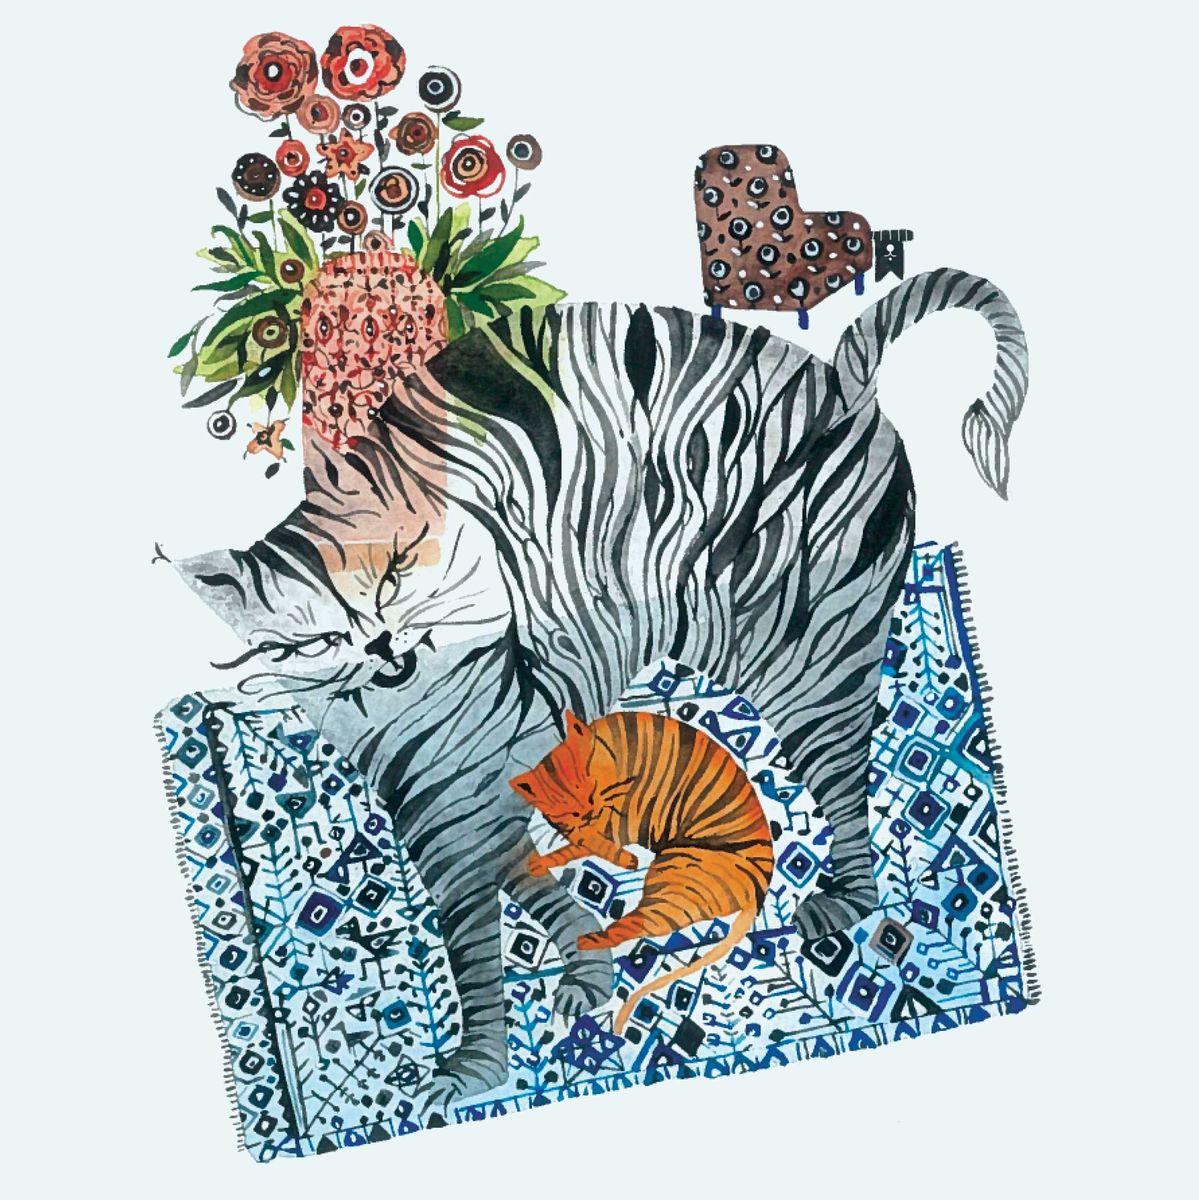 Garance-Jonathan-Blezard-Le-chat-Tigre2jpg